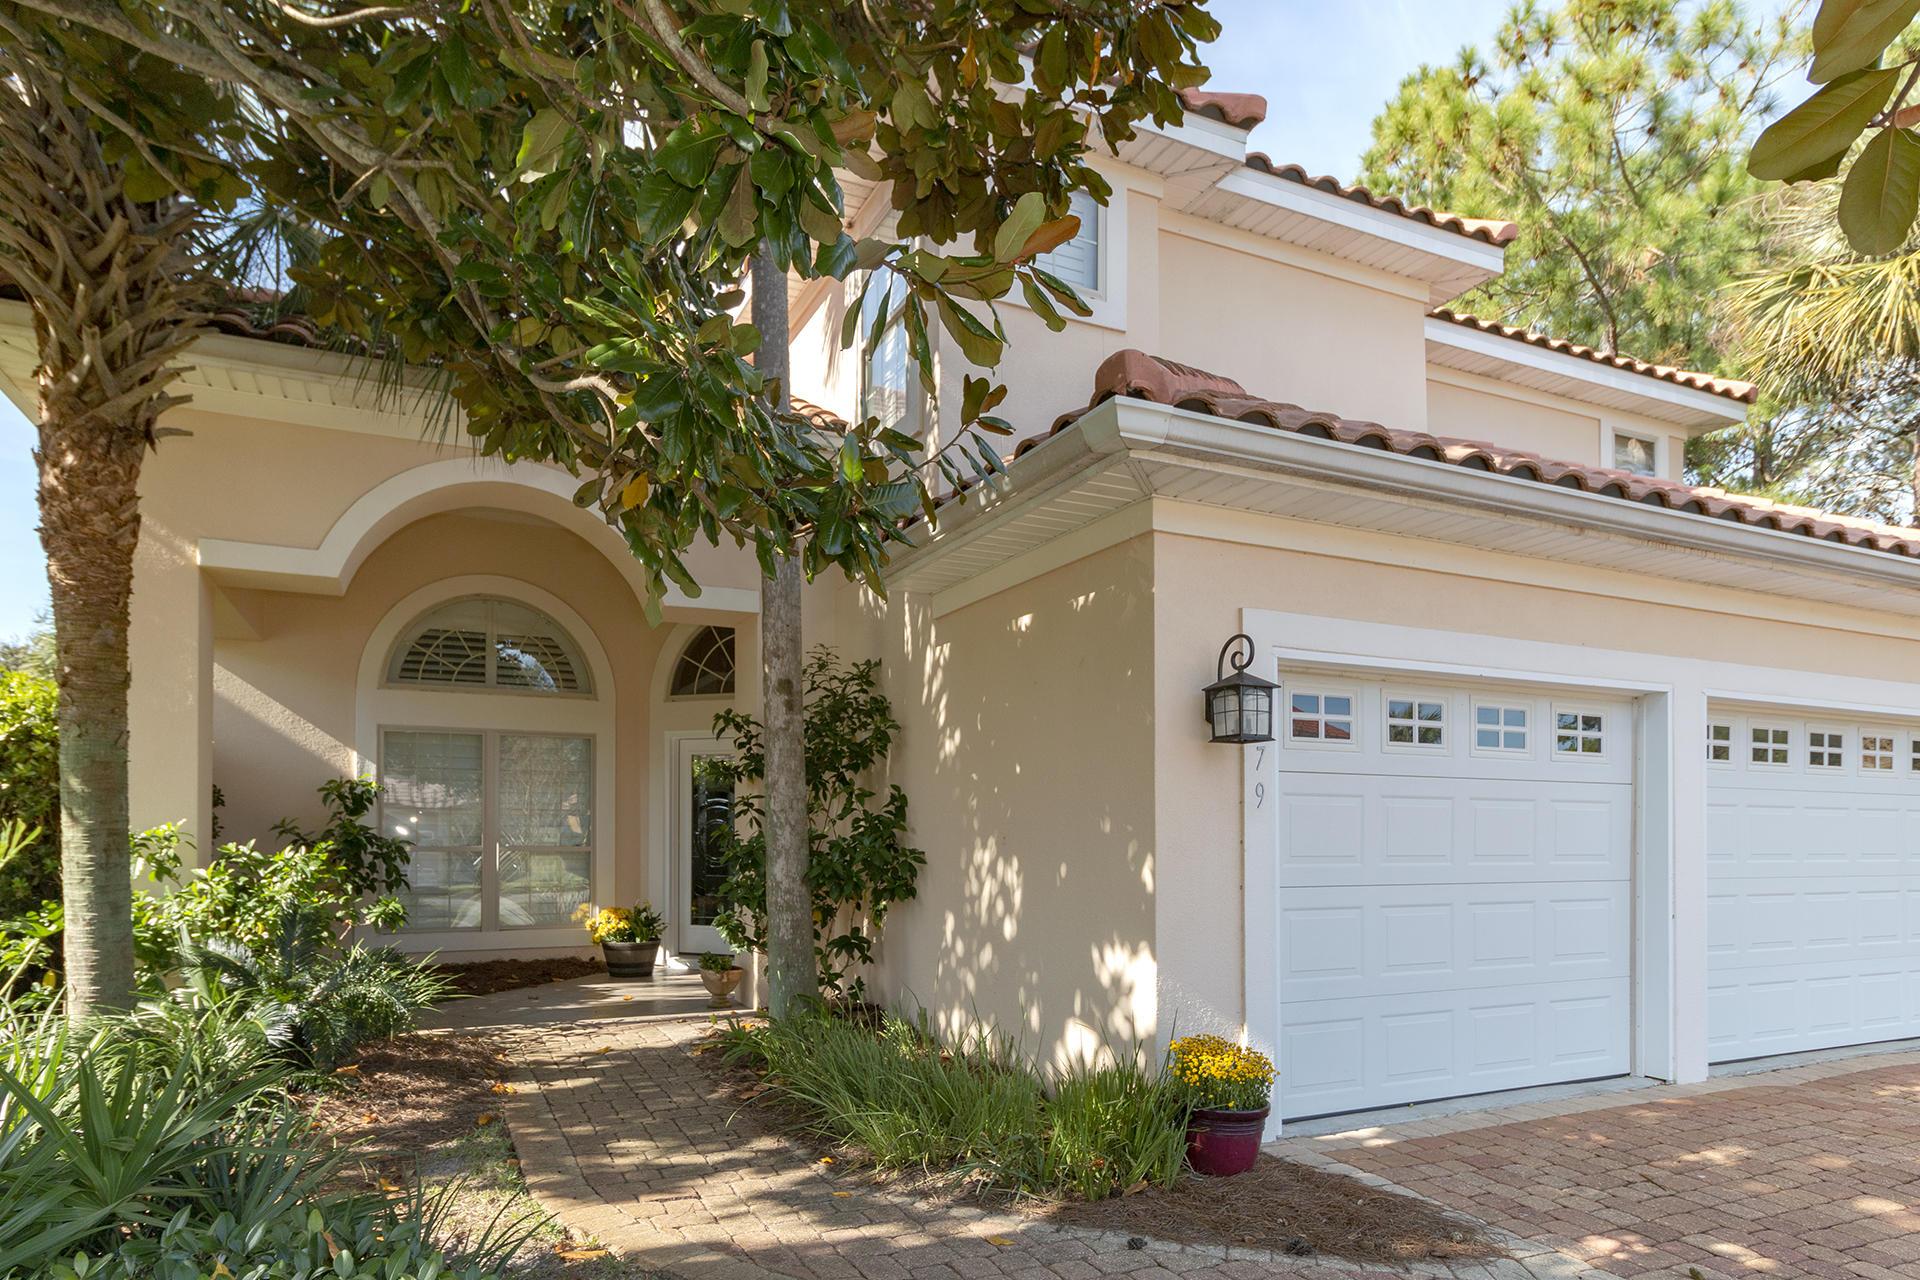 Destin Real Estate Listing, featured MLS property E810652